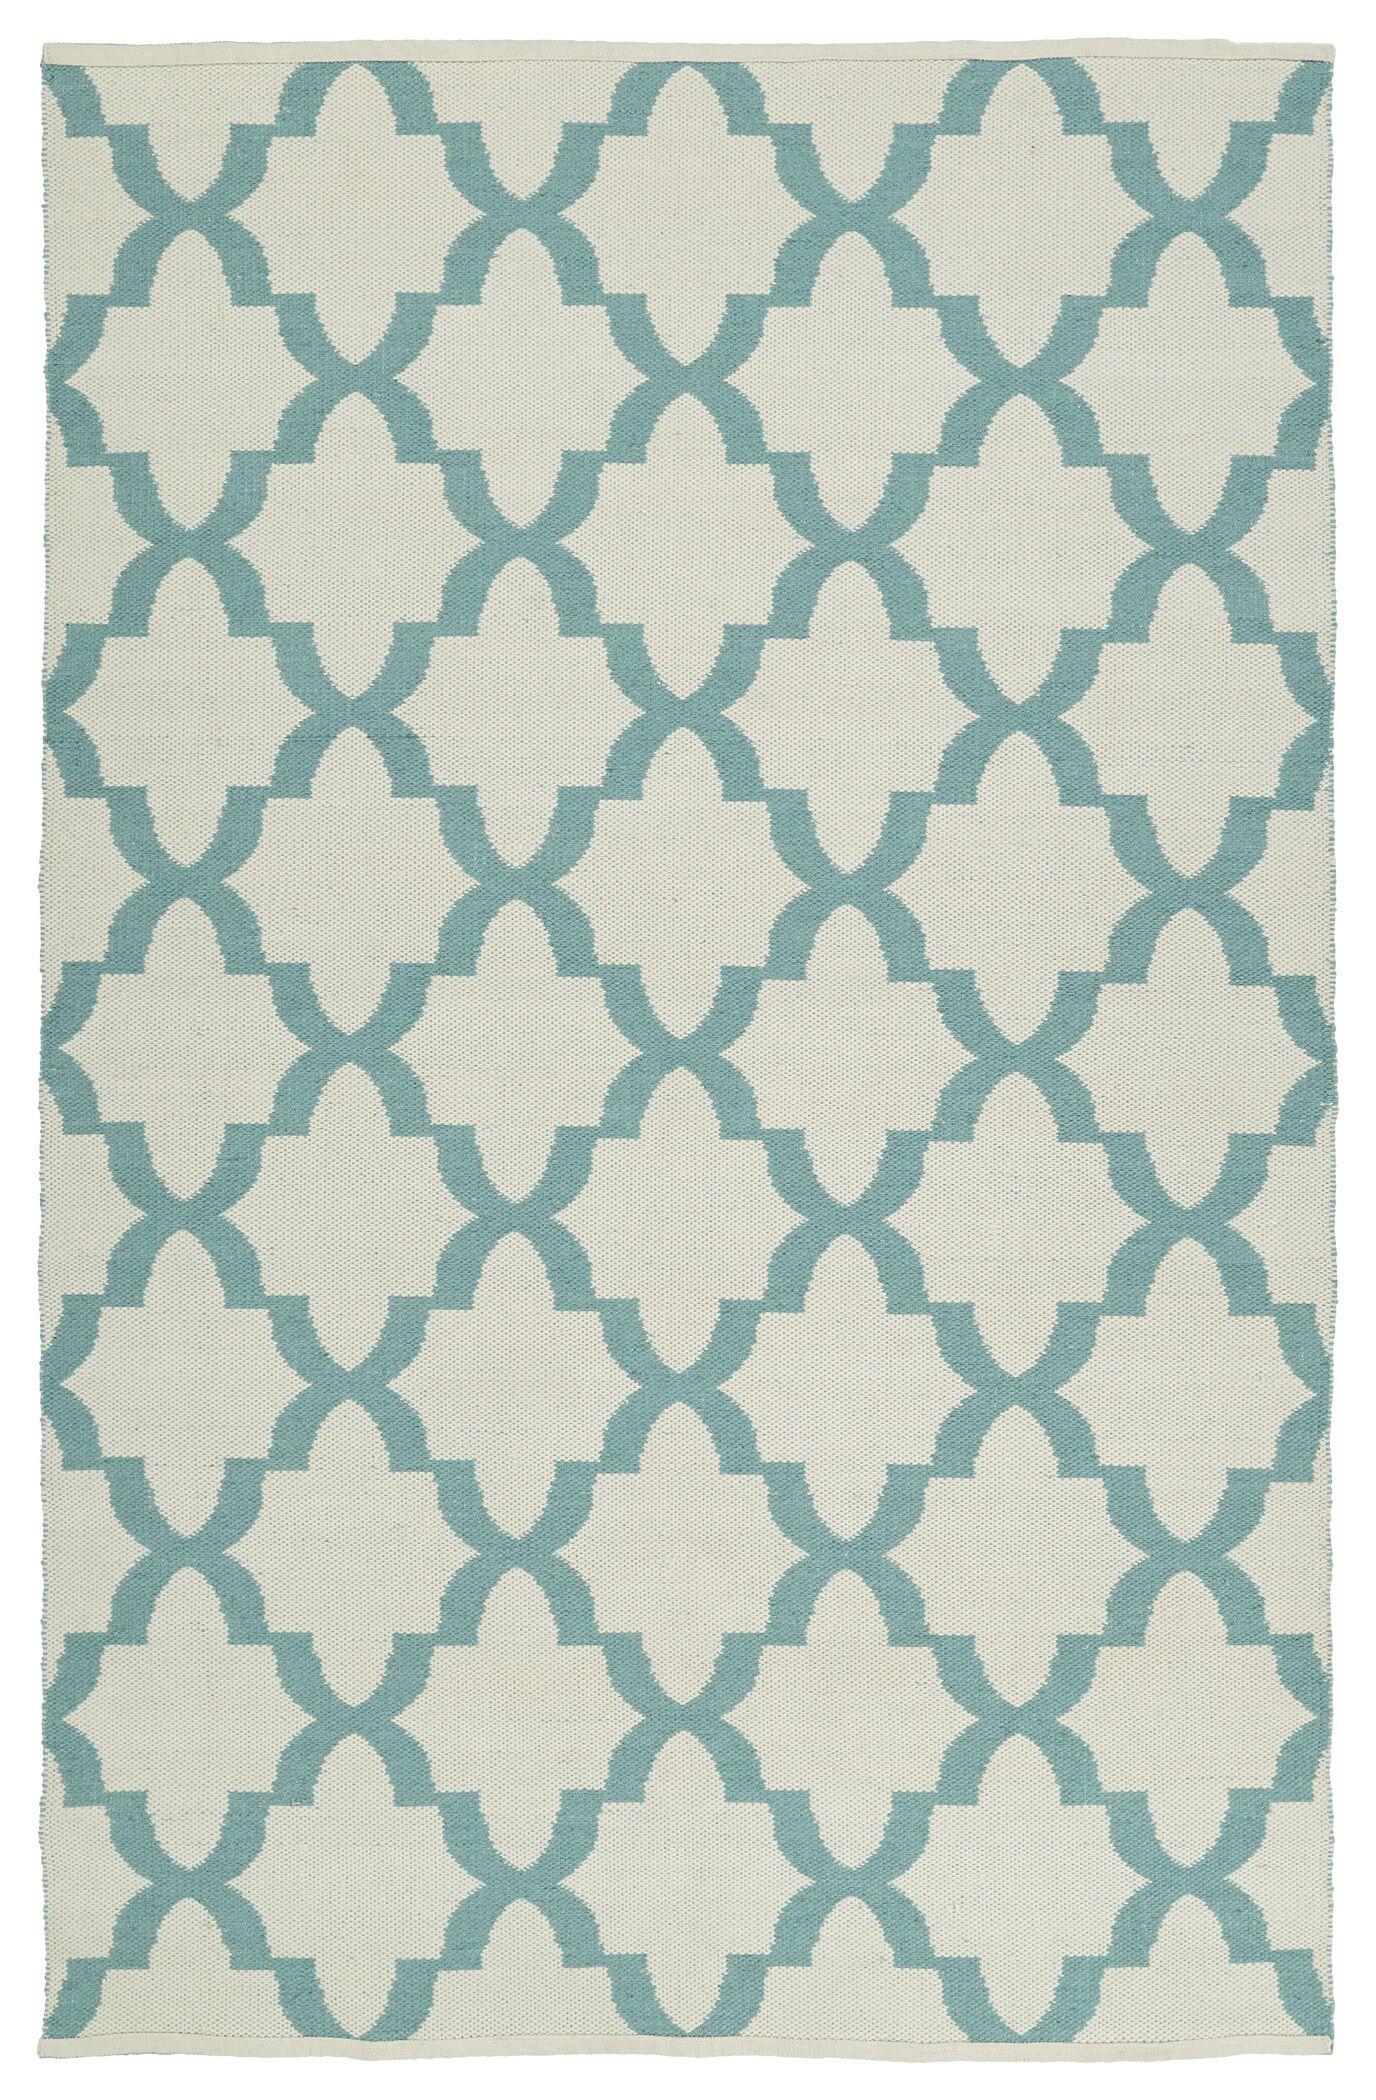 Tyesha Seafoam/Cream Indoor/Outdoor Area Rug Rug Size: Rectangle 9' x 12'